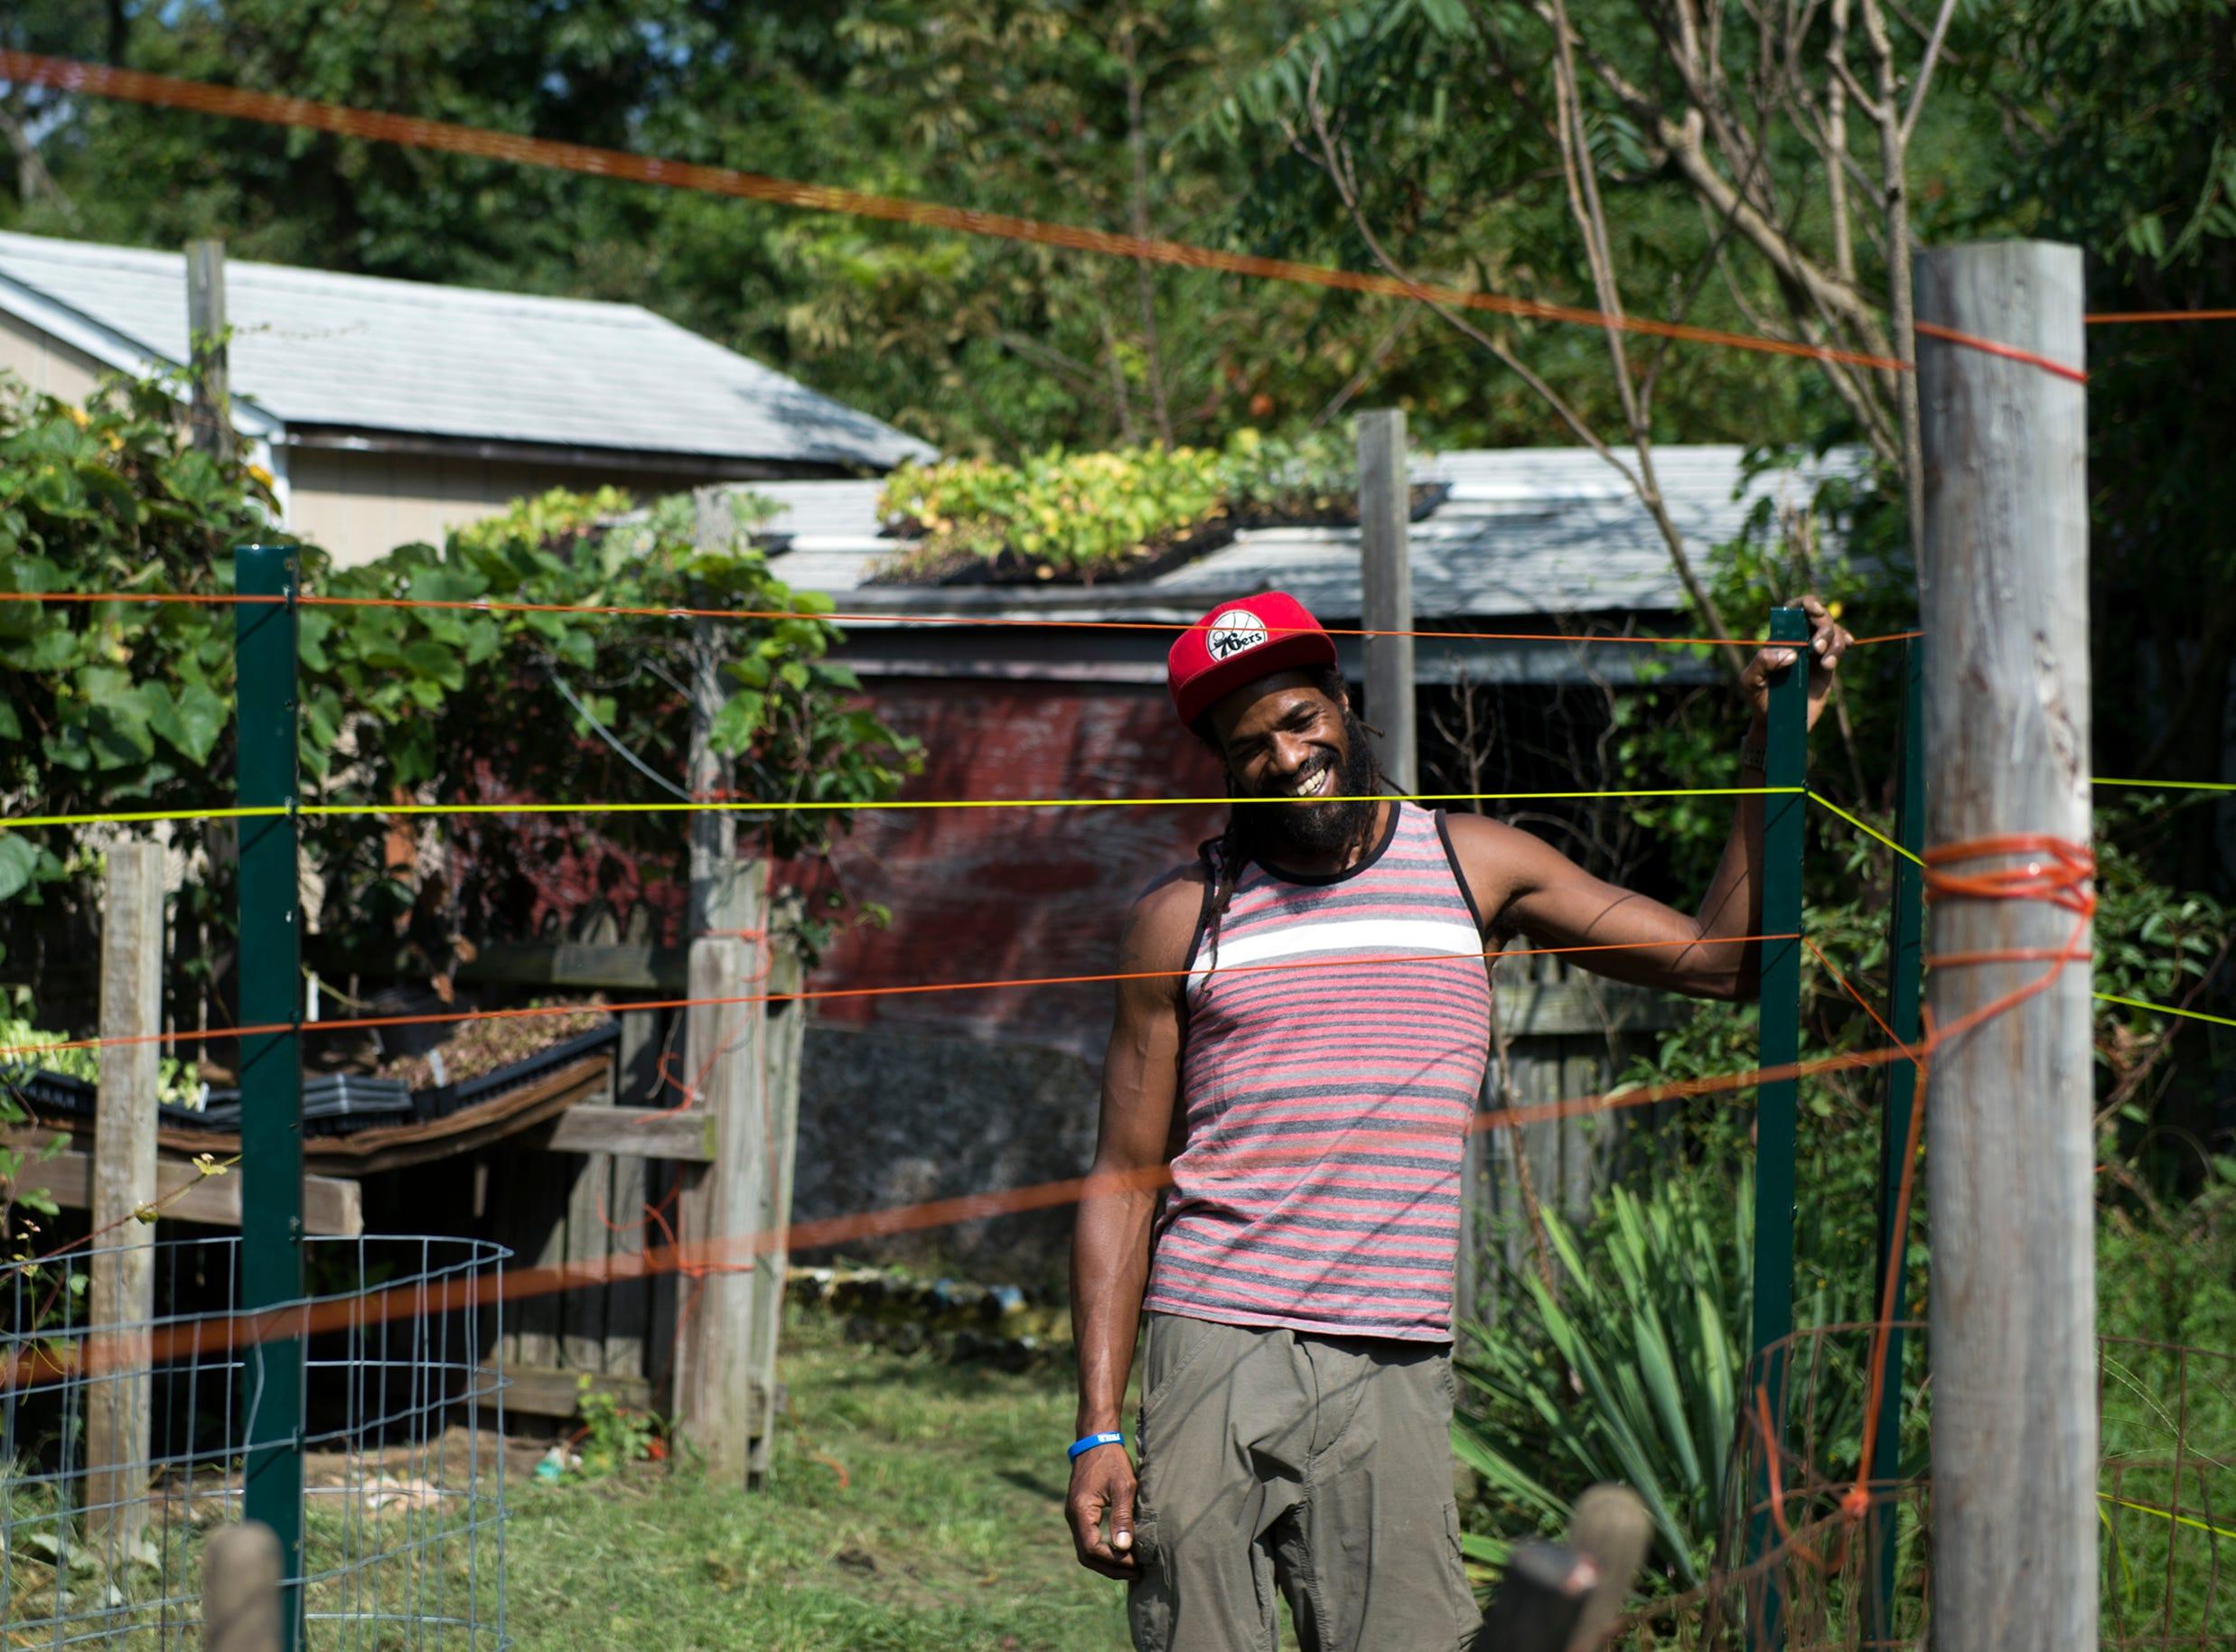 Micaiah Hall on his farm Thursday, Aug. 23, 2018 in Lawnside, N.J.